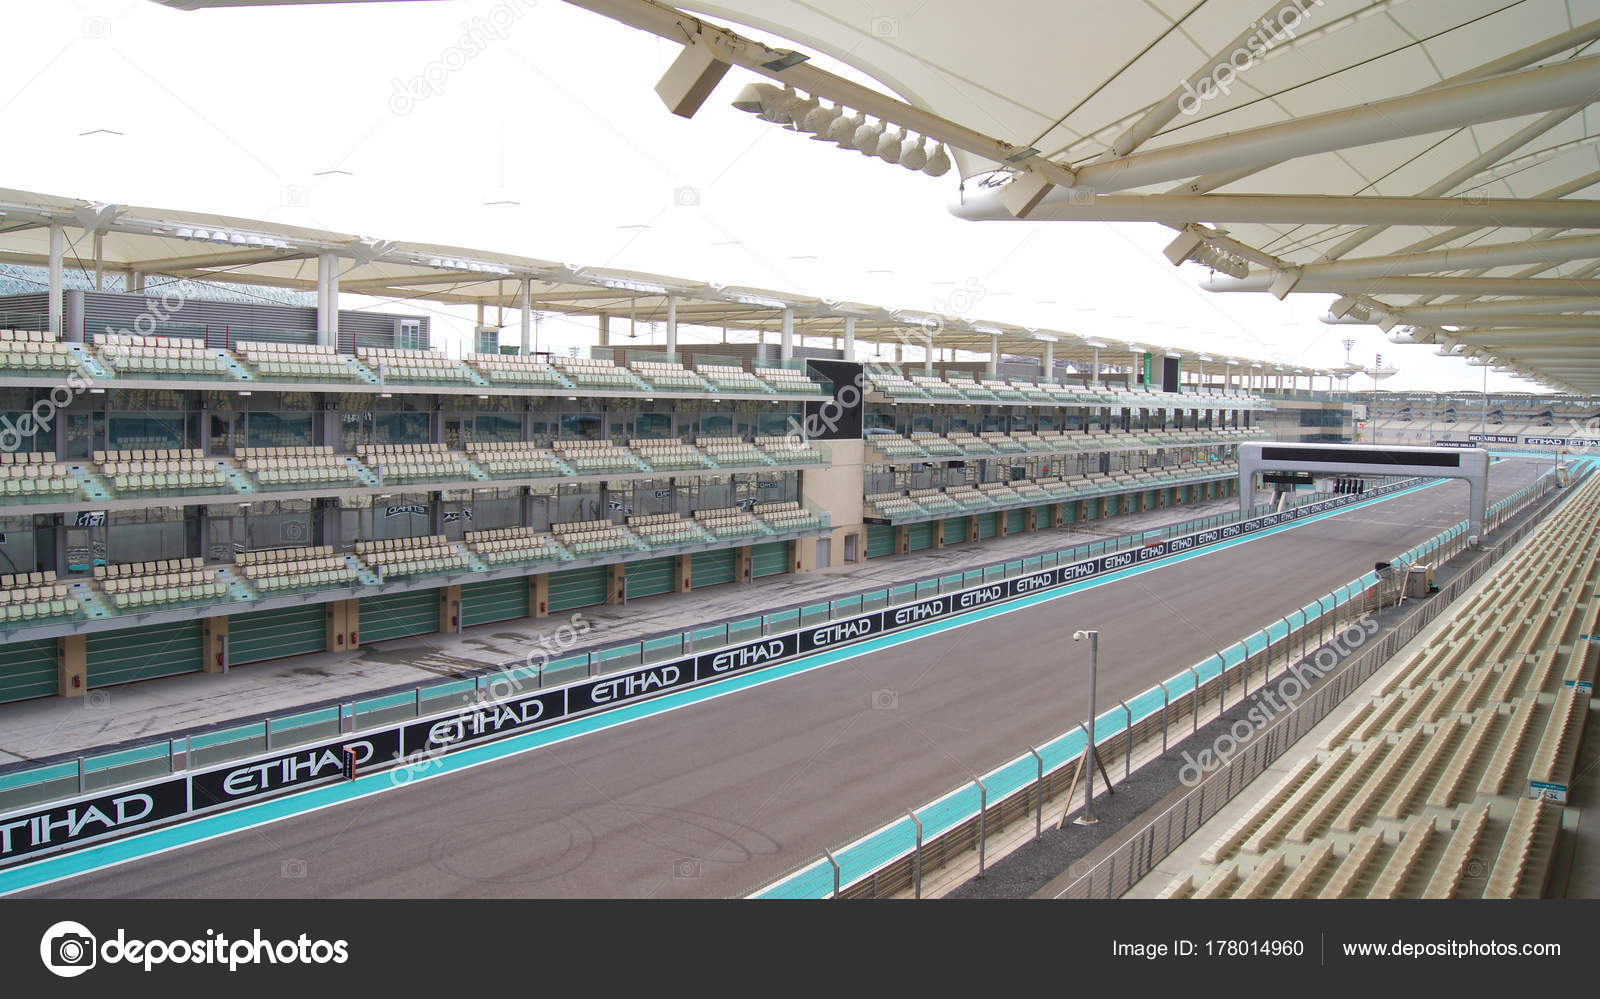 Circuito Yas Marina : Abu dhabi emiratos Árabes 04 de abril de 2014: el yas marina de